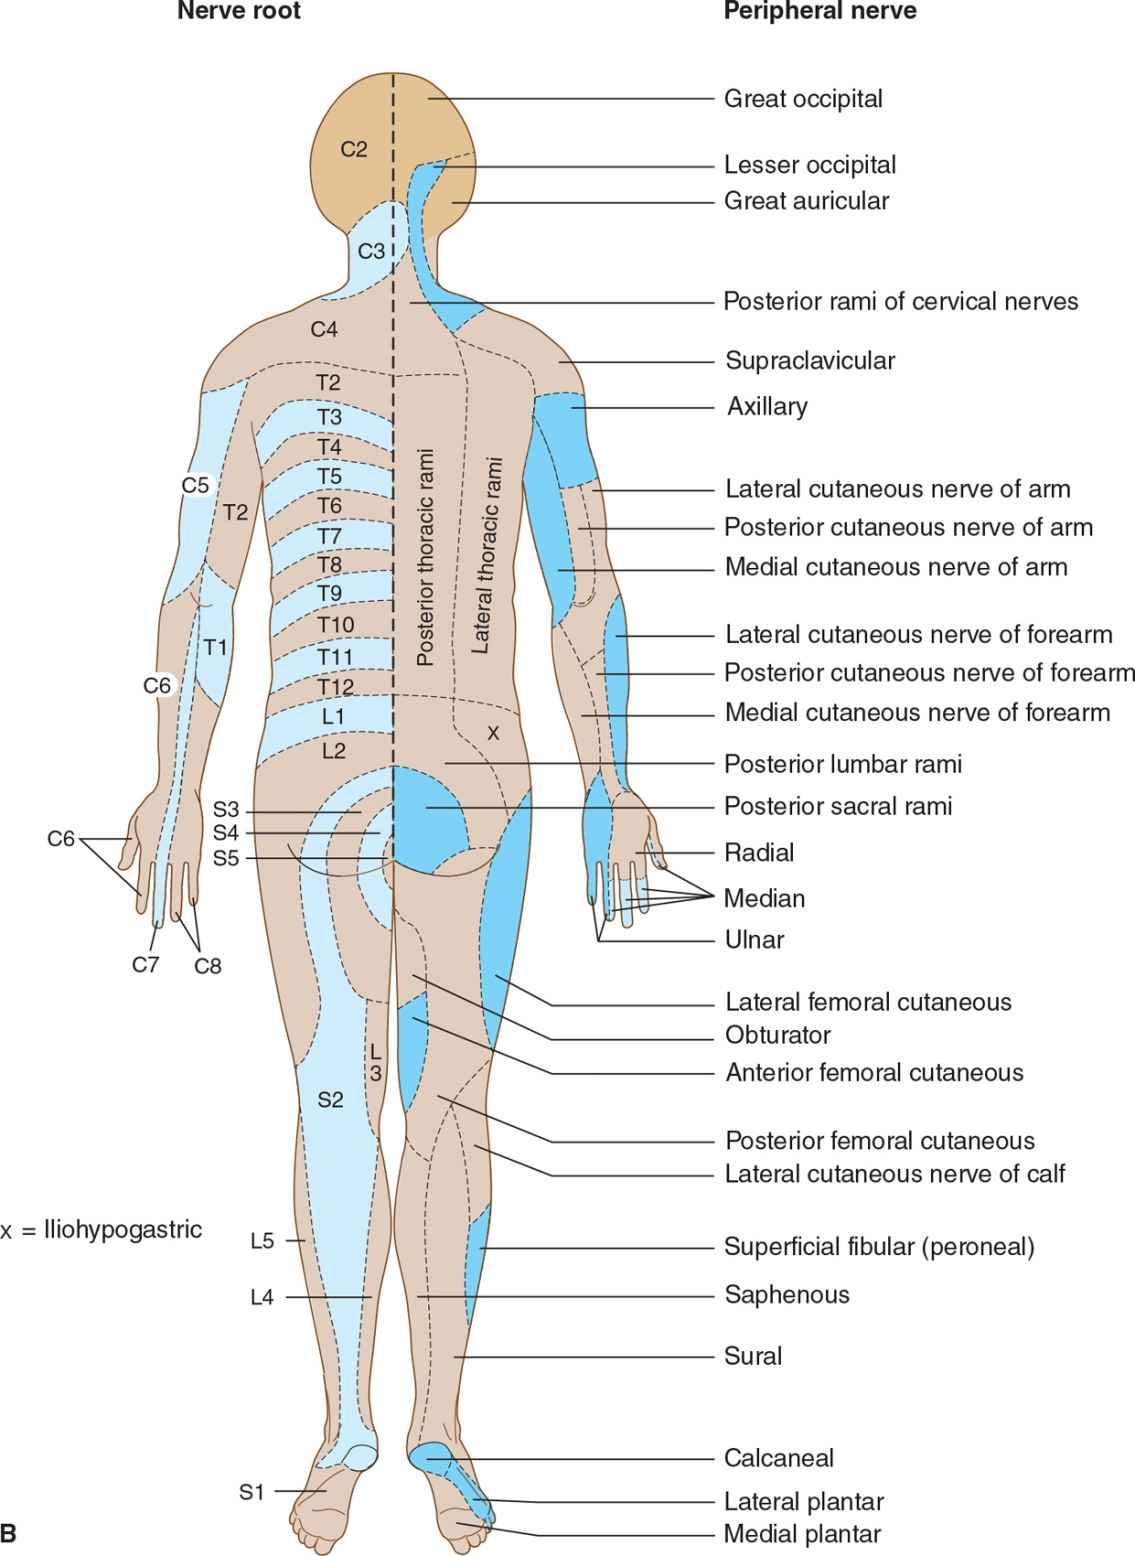 l4 nerve pain diagram wiring of dol motor starter sensory disorders neupsy key